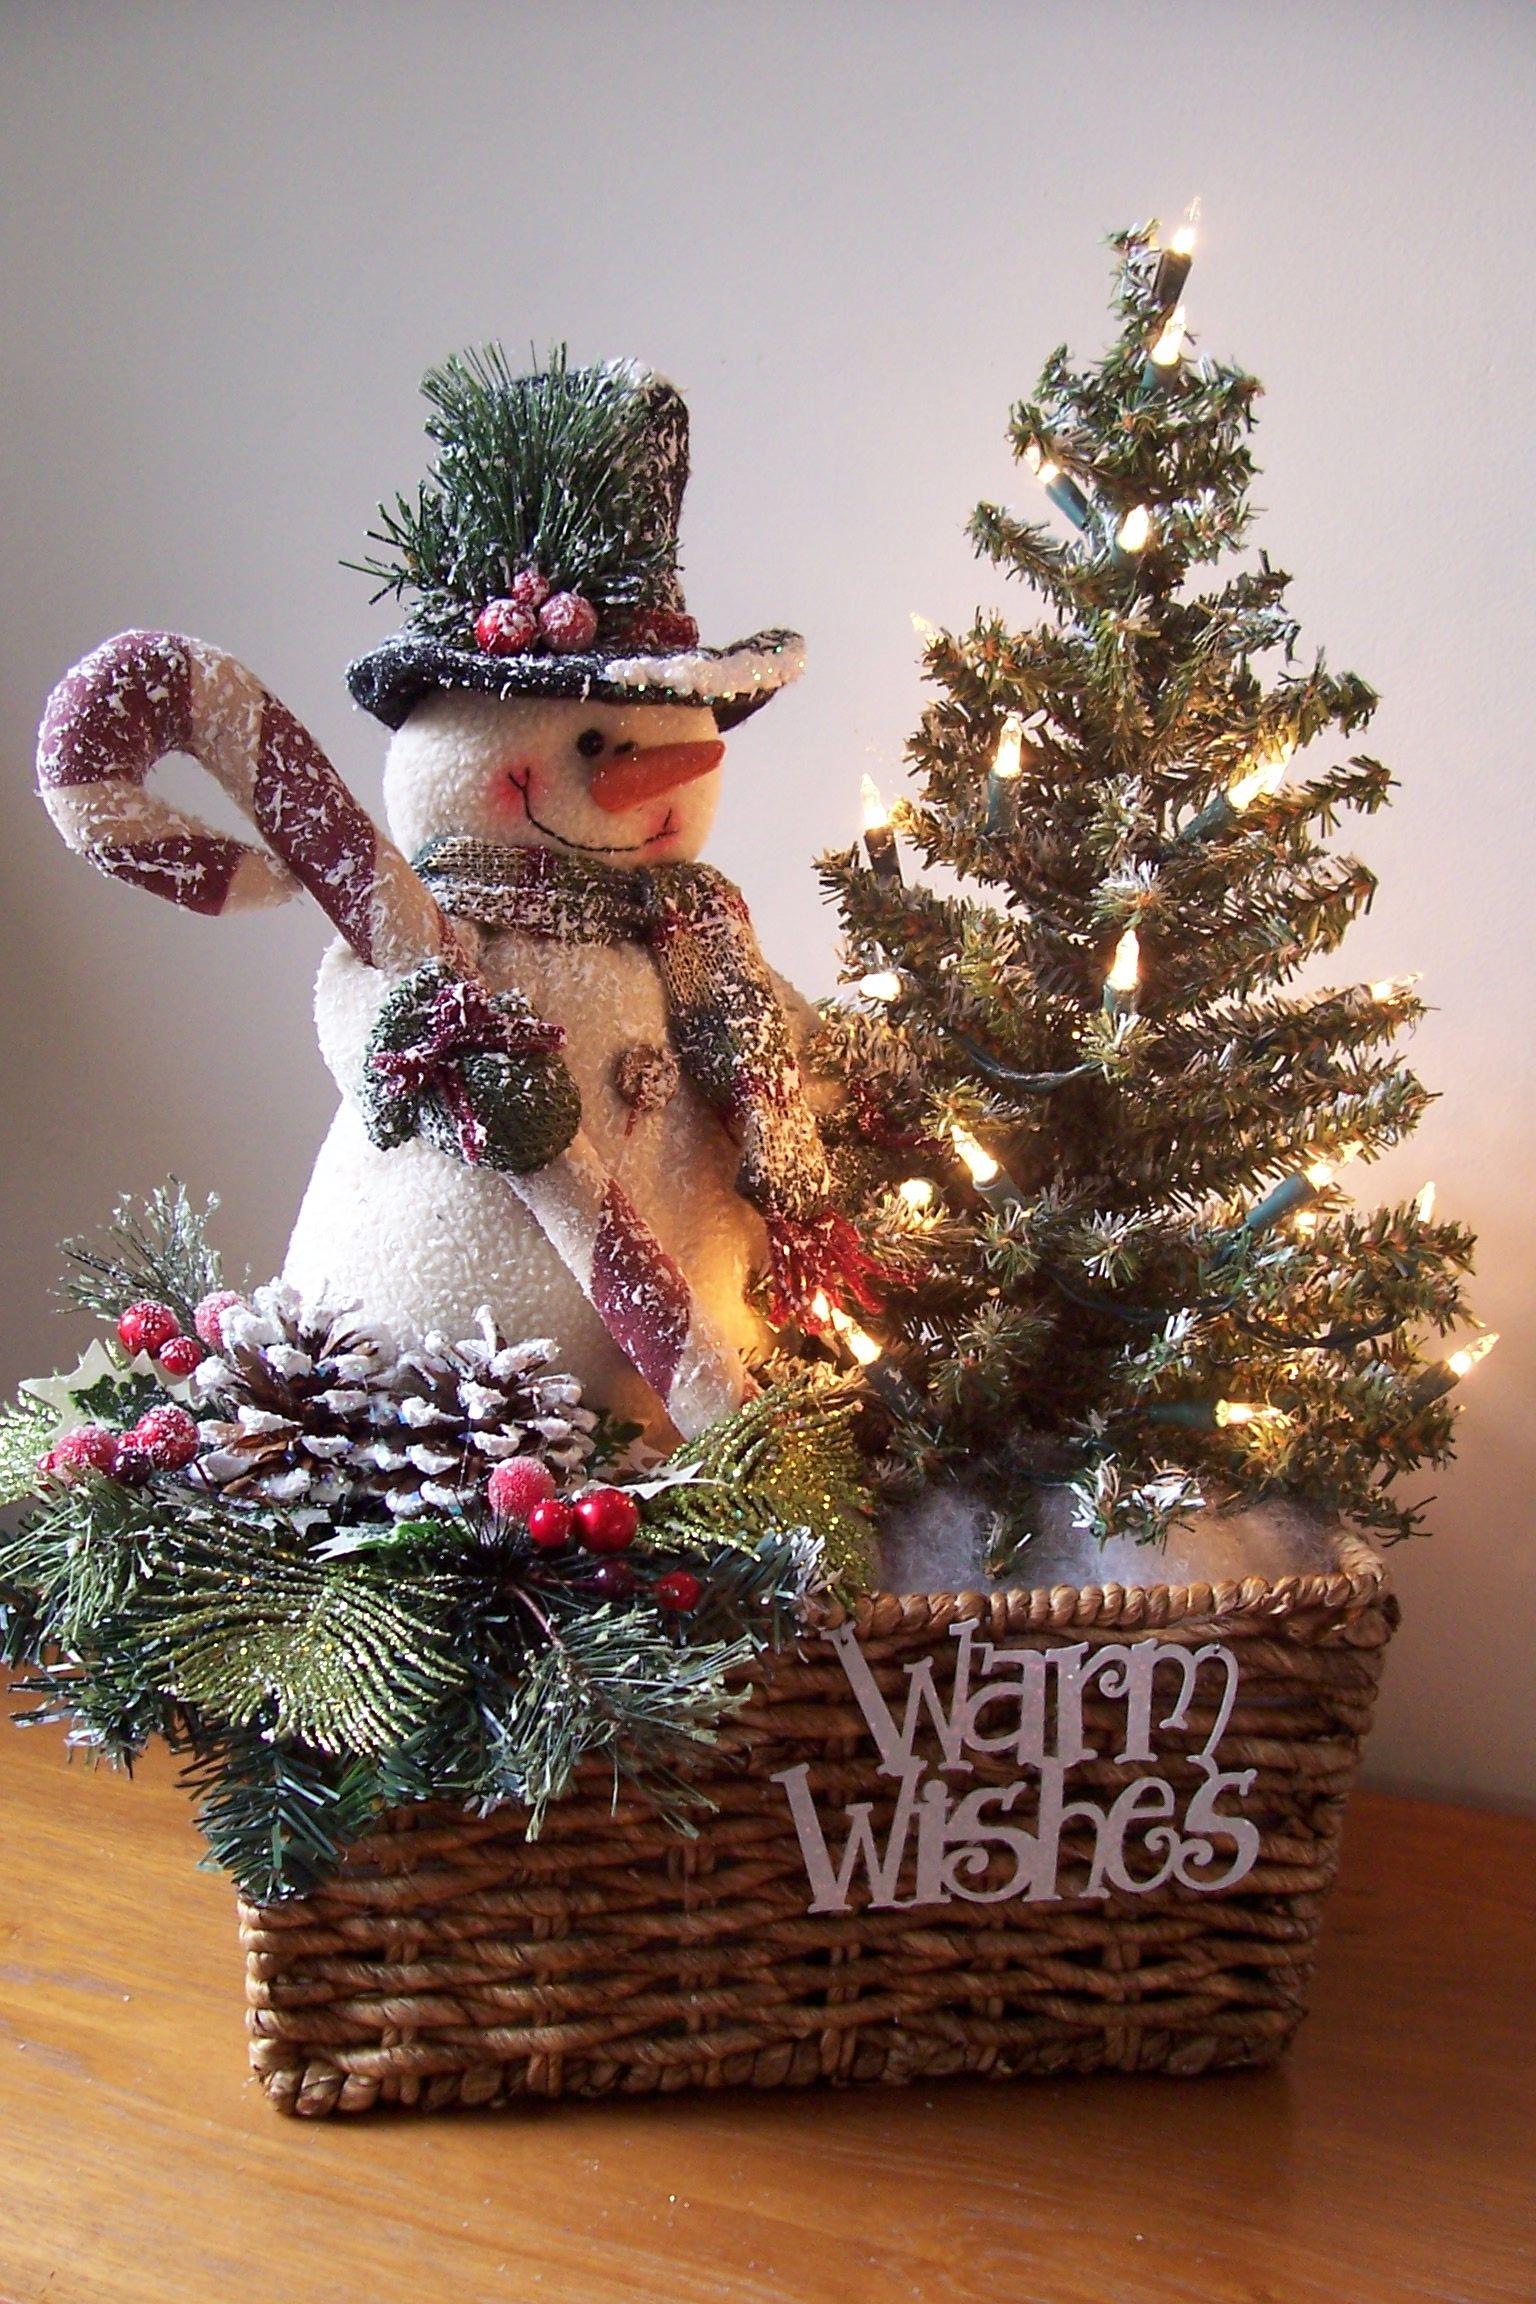 Christmas Snowmen Decorations.Snowman Decorations Ideas For Christmas Homes Holli Daze